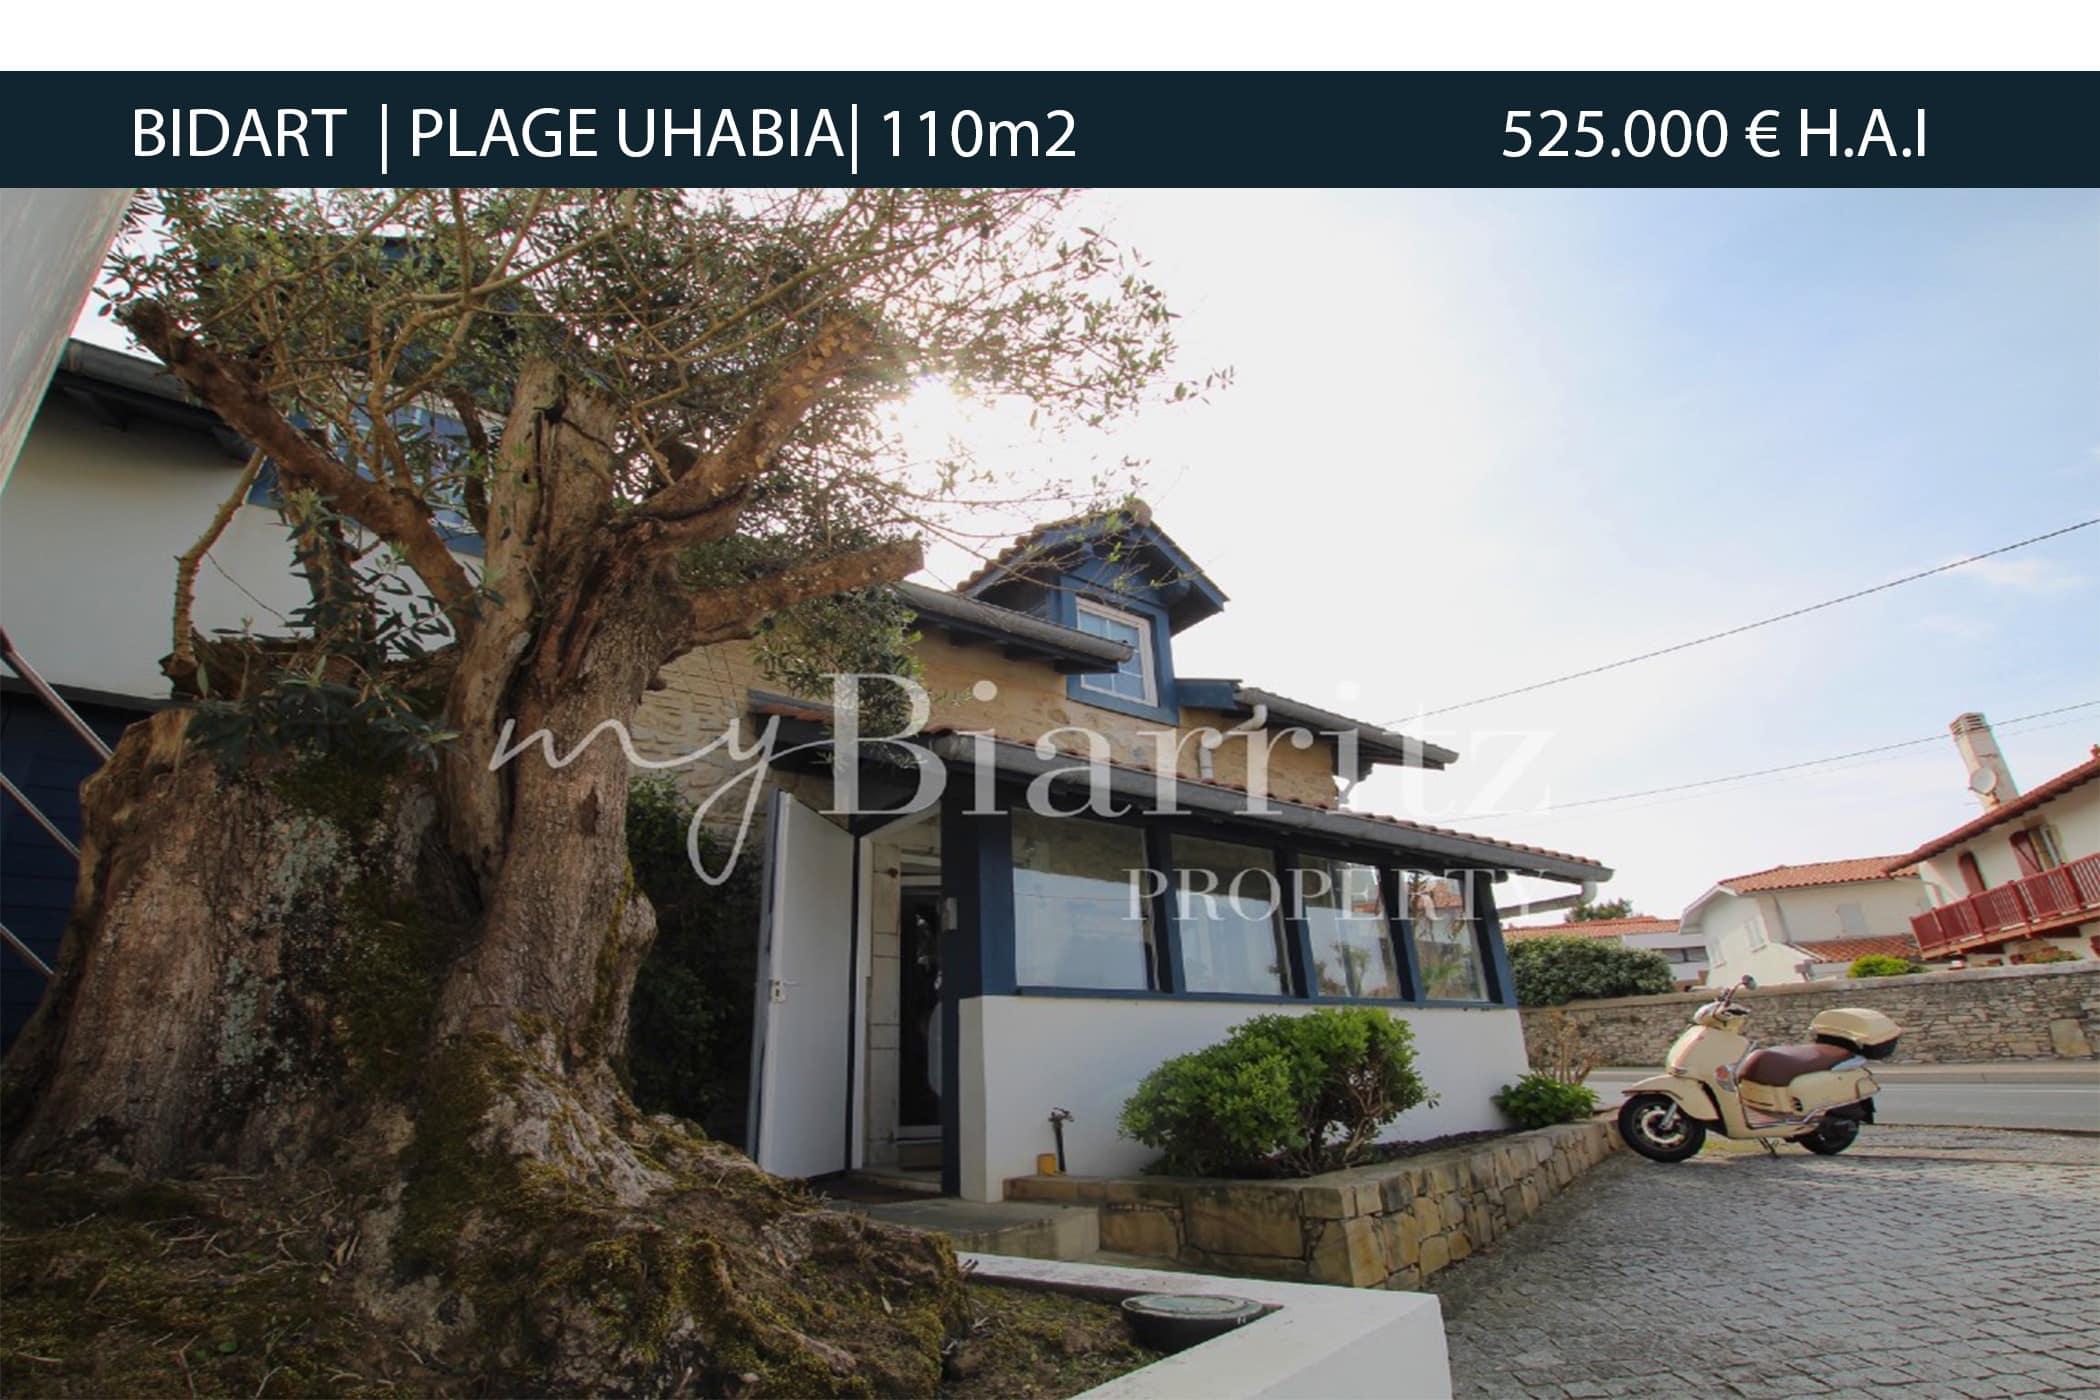 BIDART-PLAGE-UHABIA